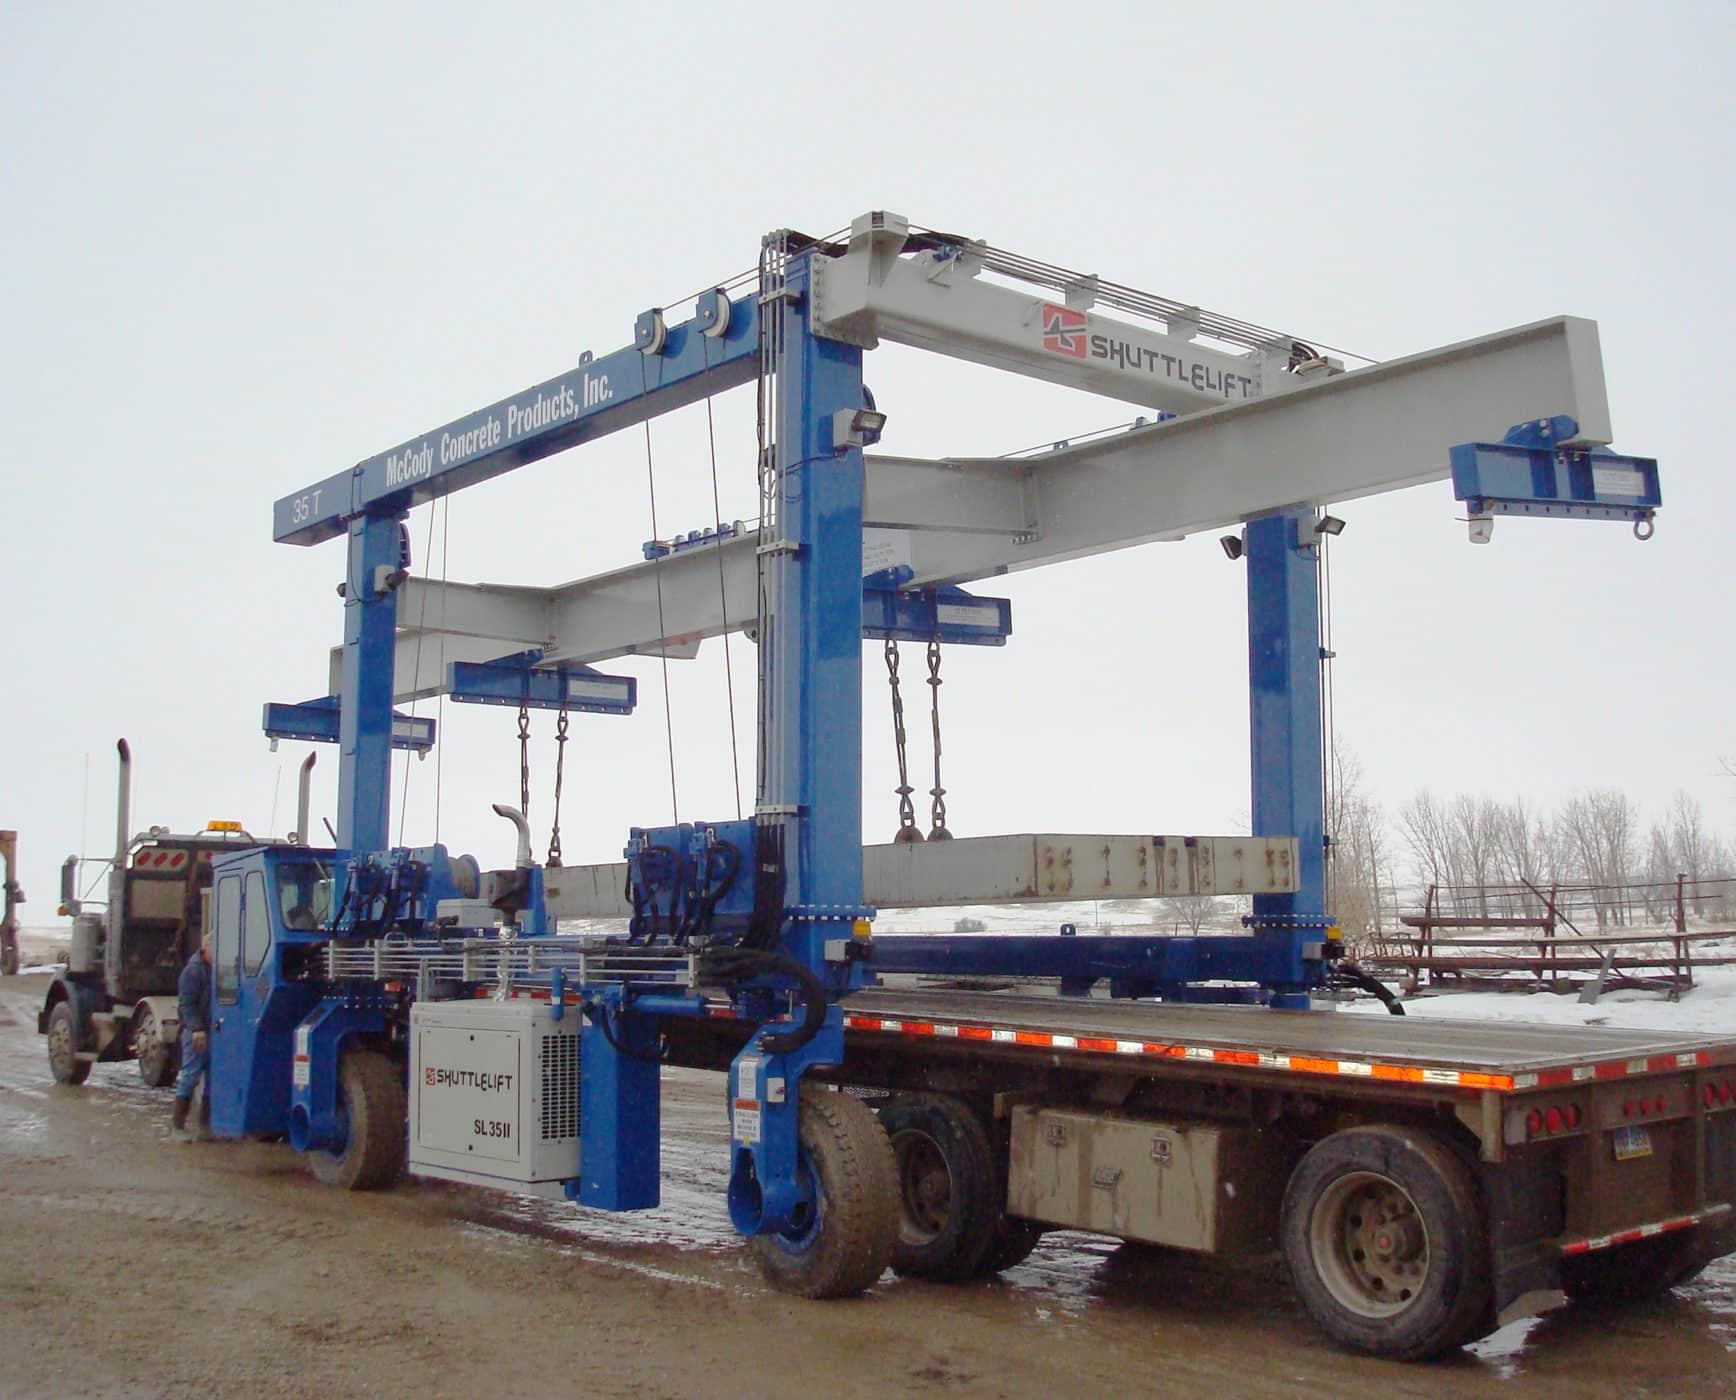 Custom Shuttlelift 35 Ton Lifting Crane